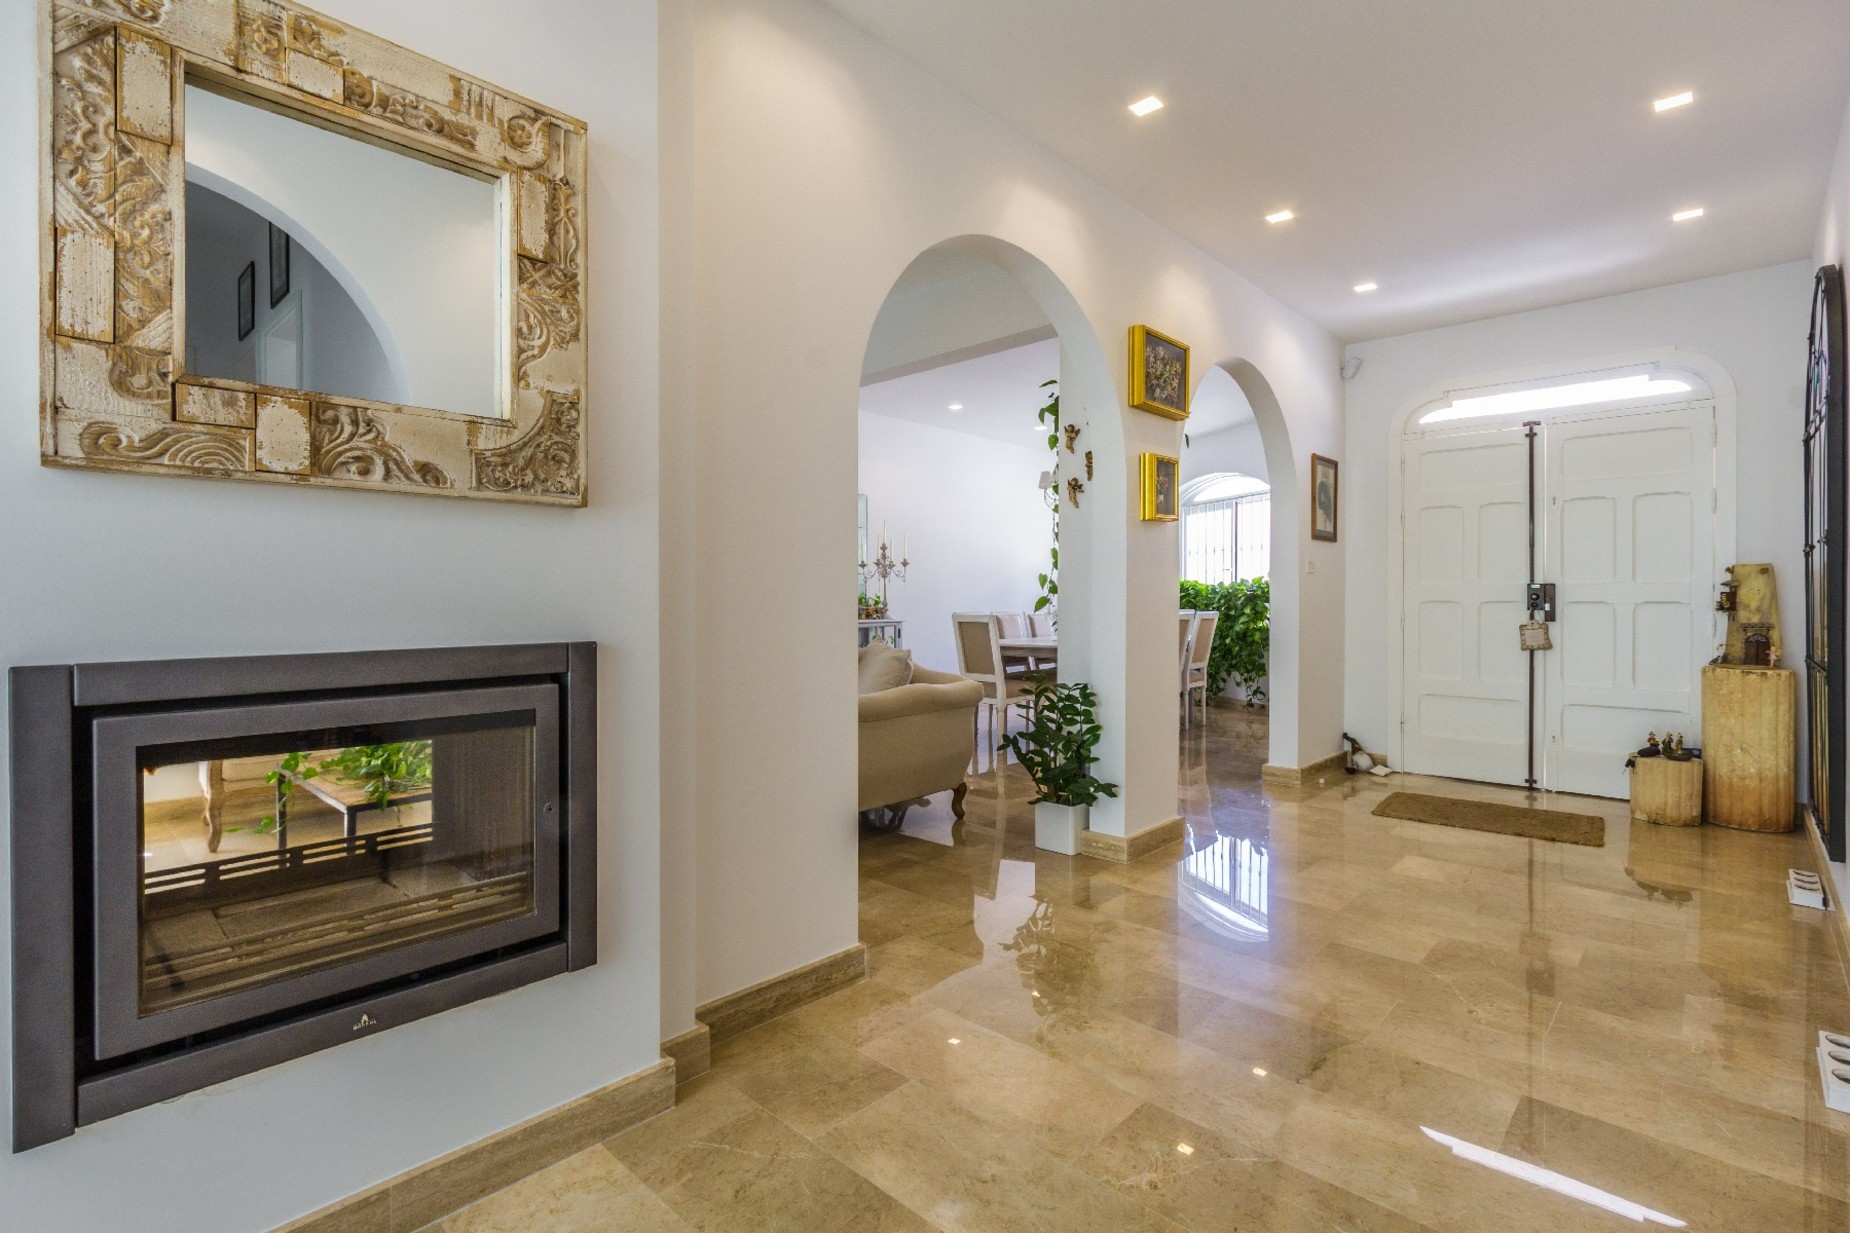 3 bed Villa For Sale in San Gwann, San Gwann - thumb 12